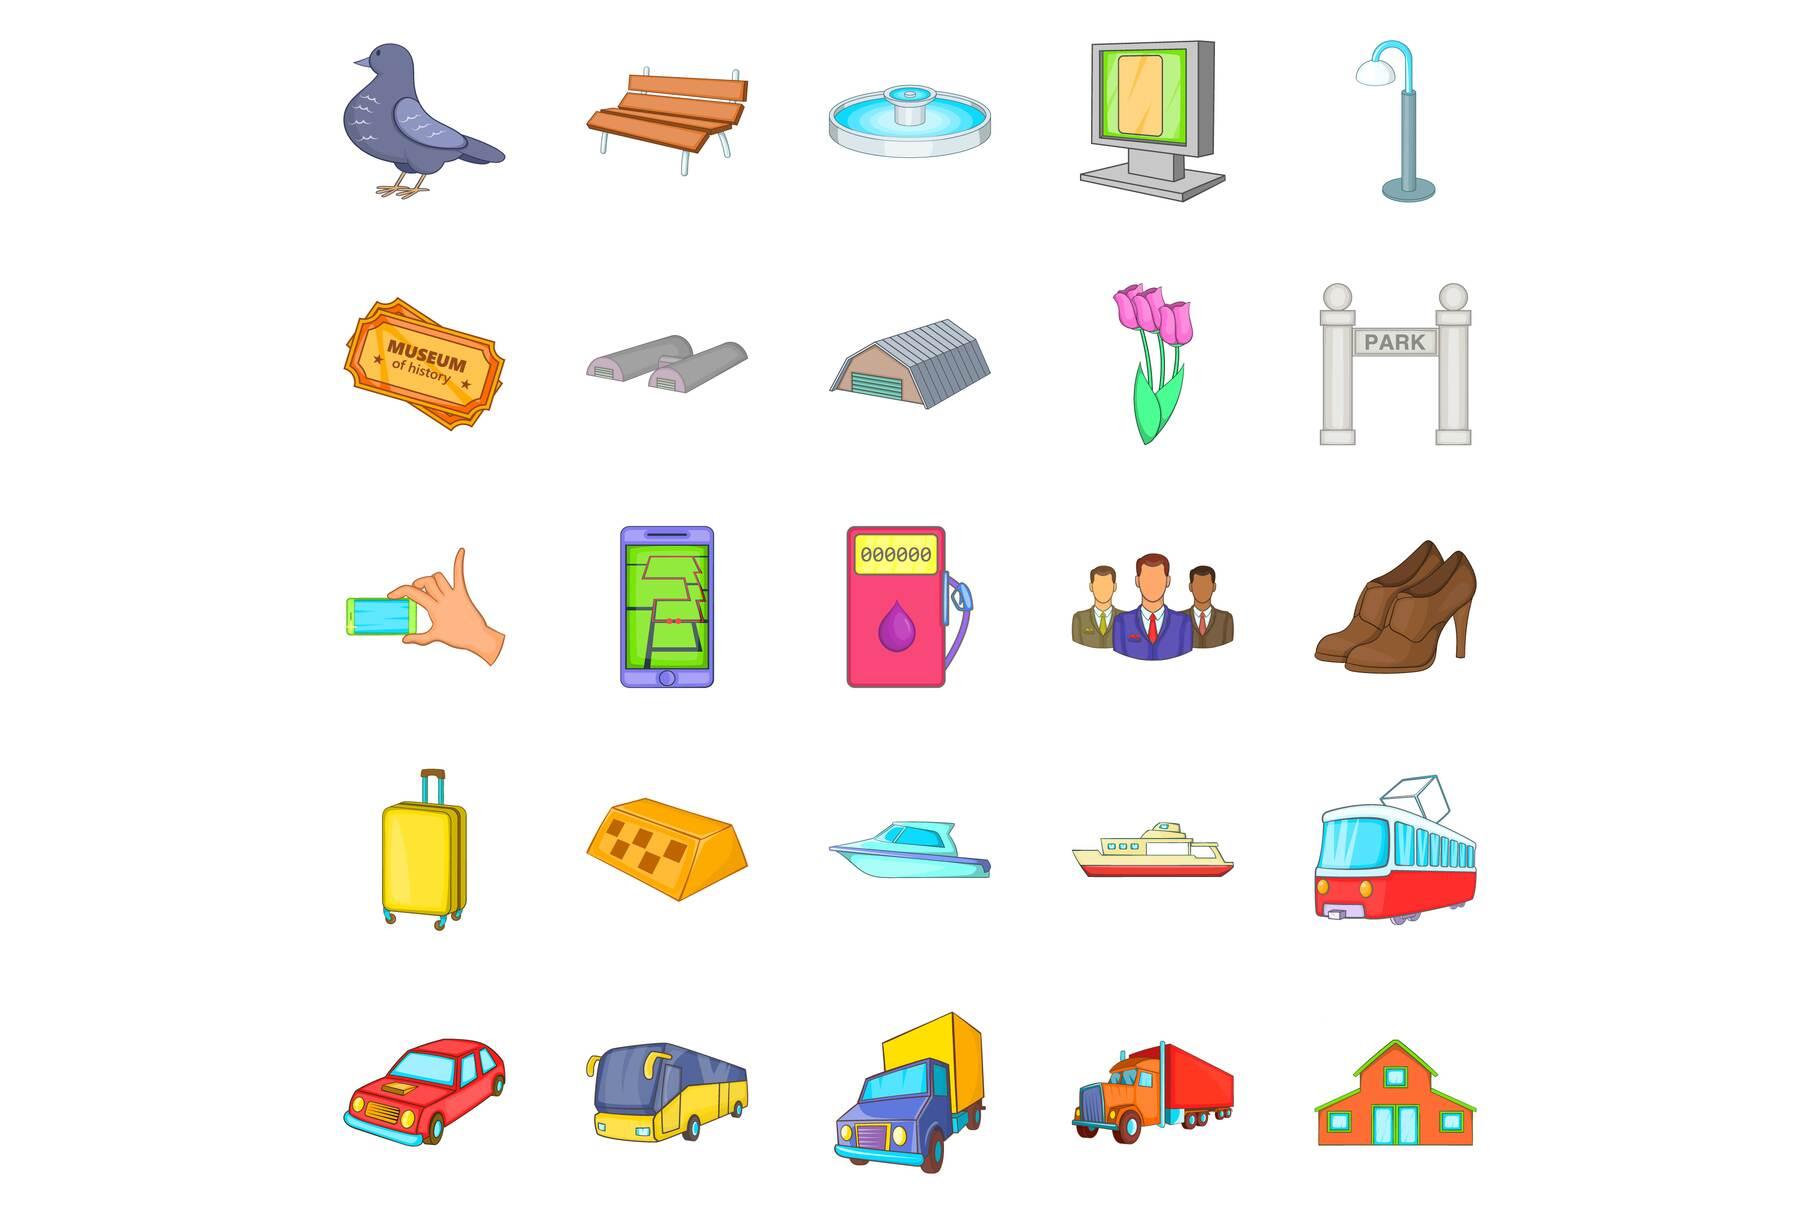 City transport icons set, cartoon style example image 1